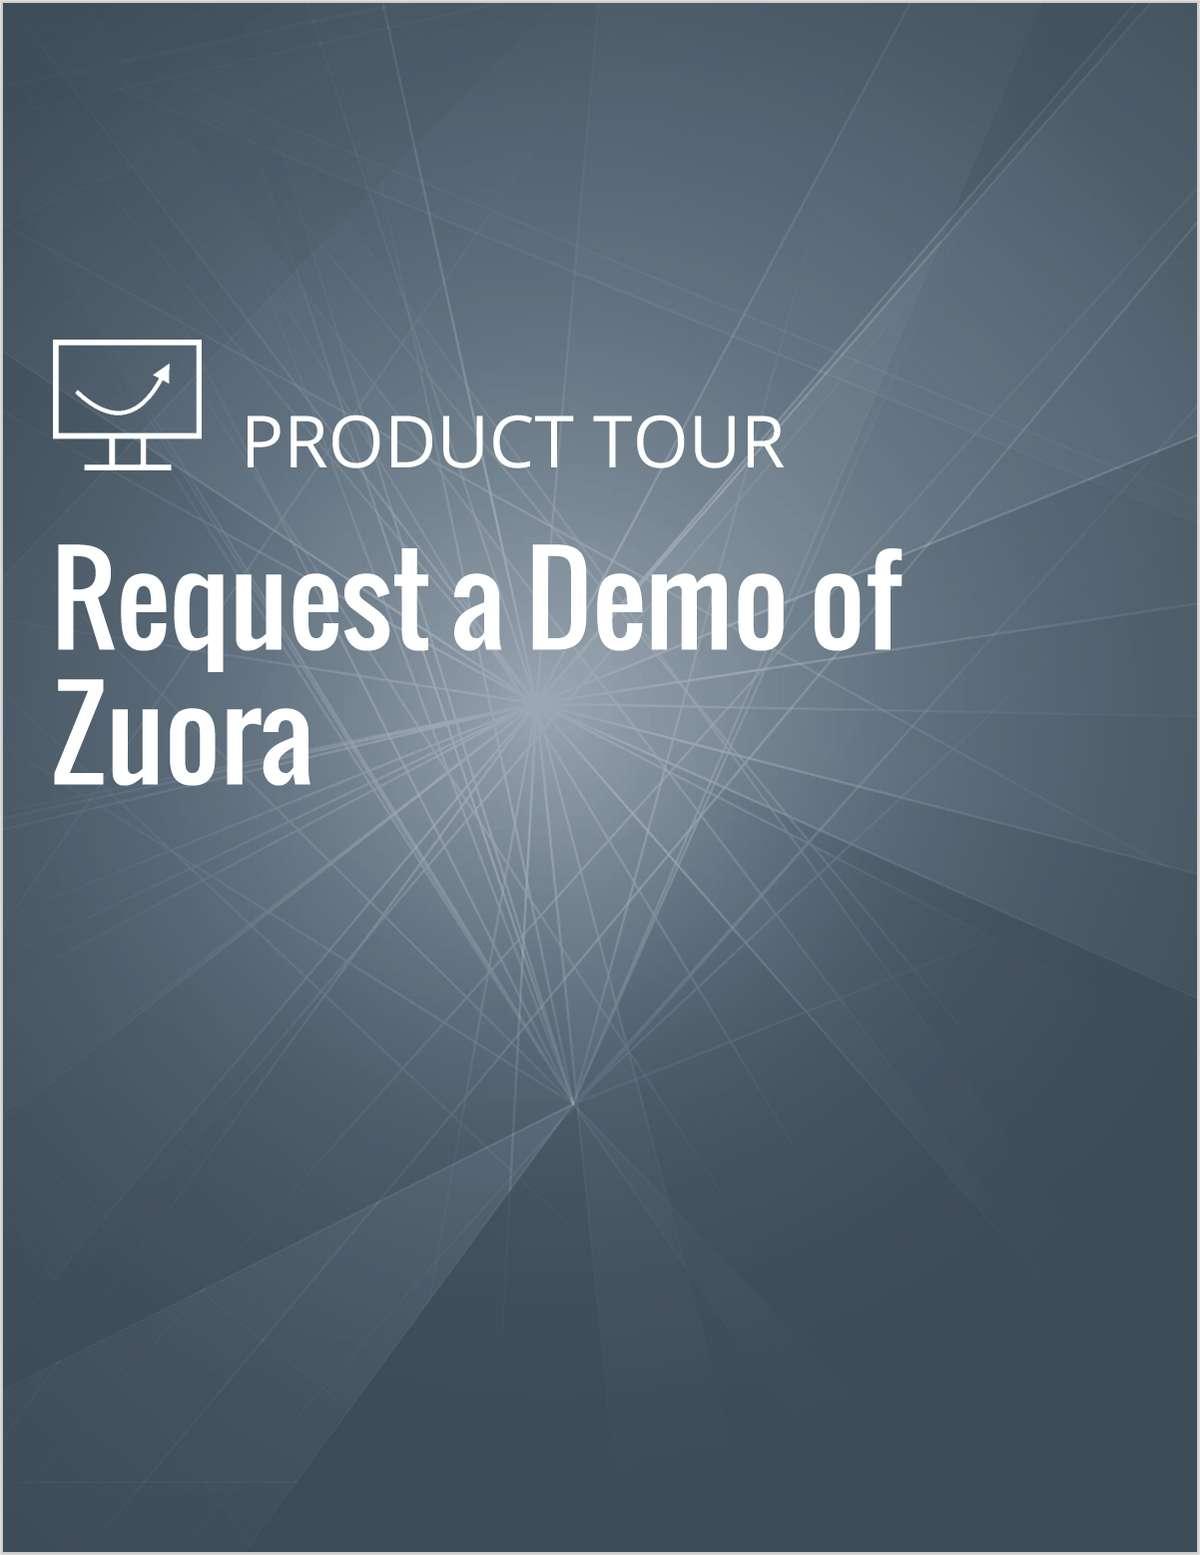 Request a Demo of Zuora